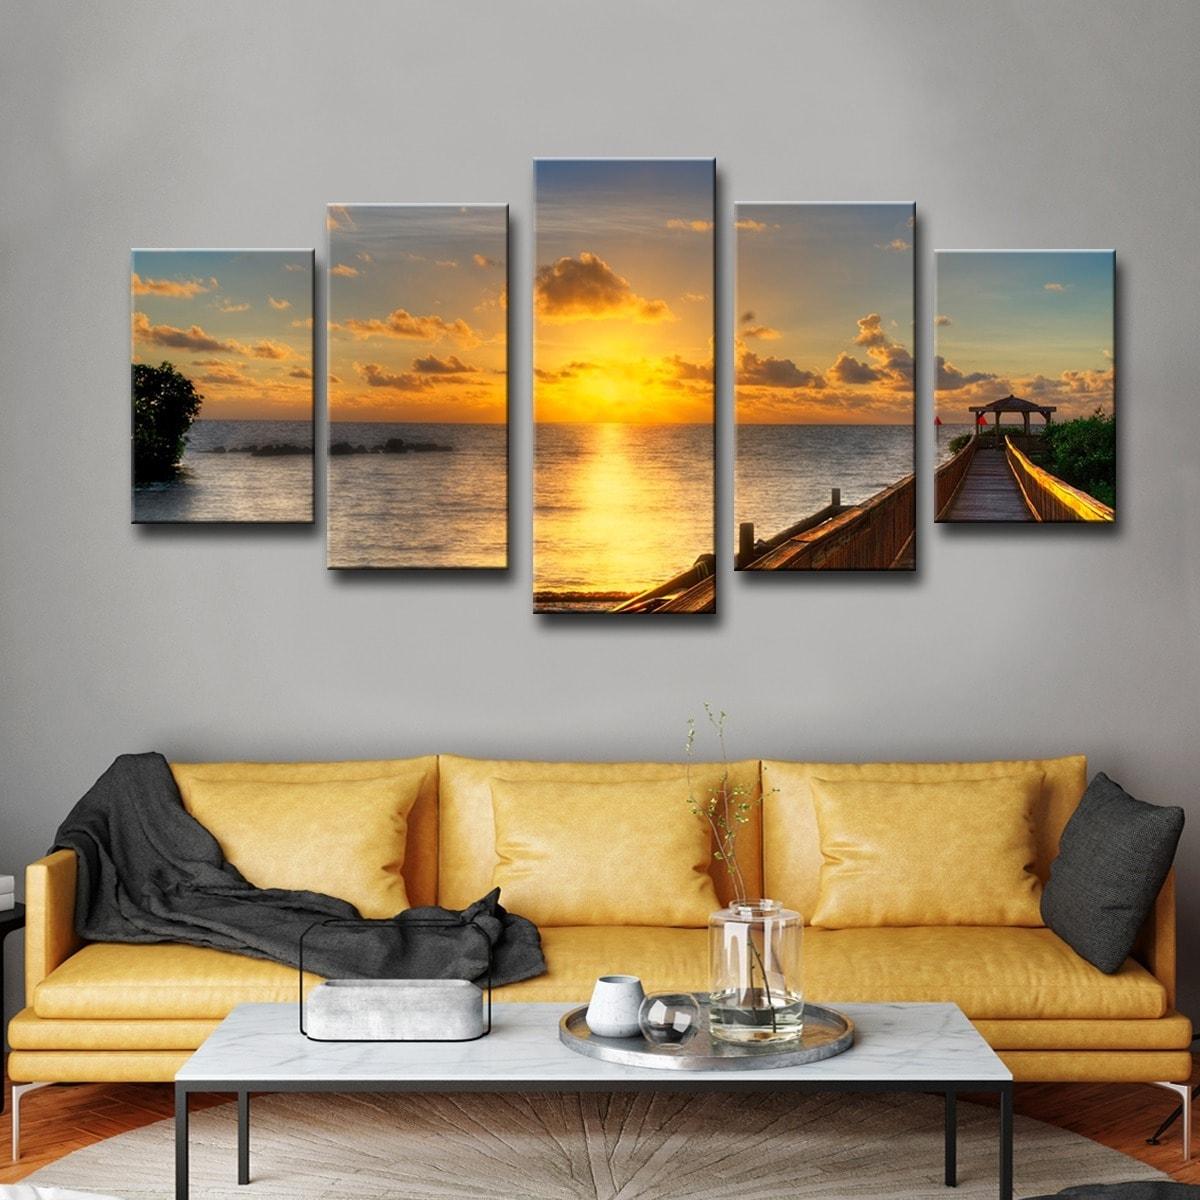 Havenside Home Key's Sunrise' 5-piece Set Canvas Wall Art by Bruce Bain